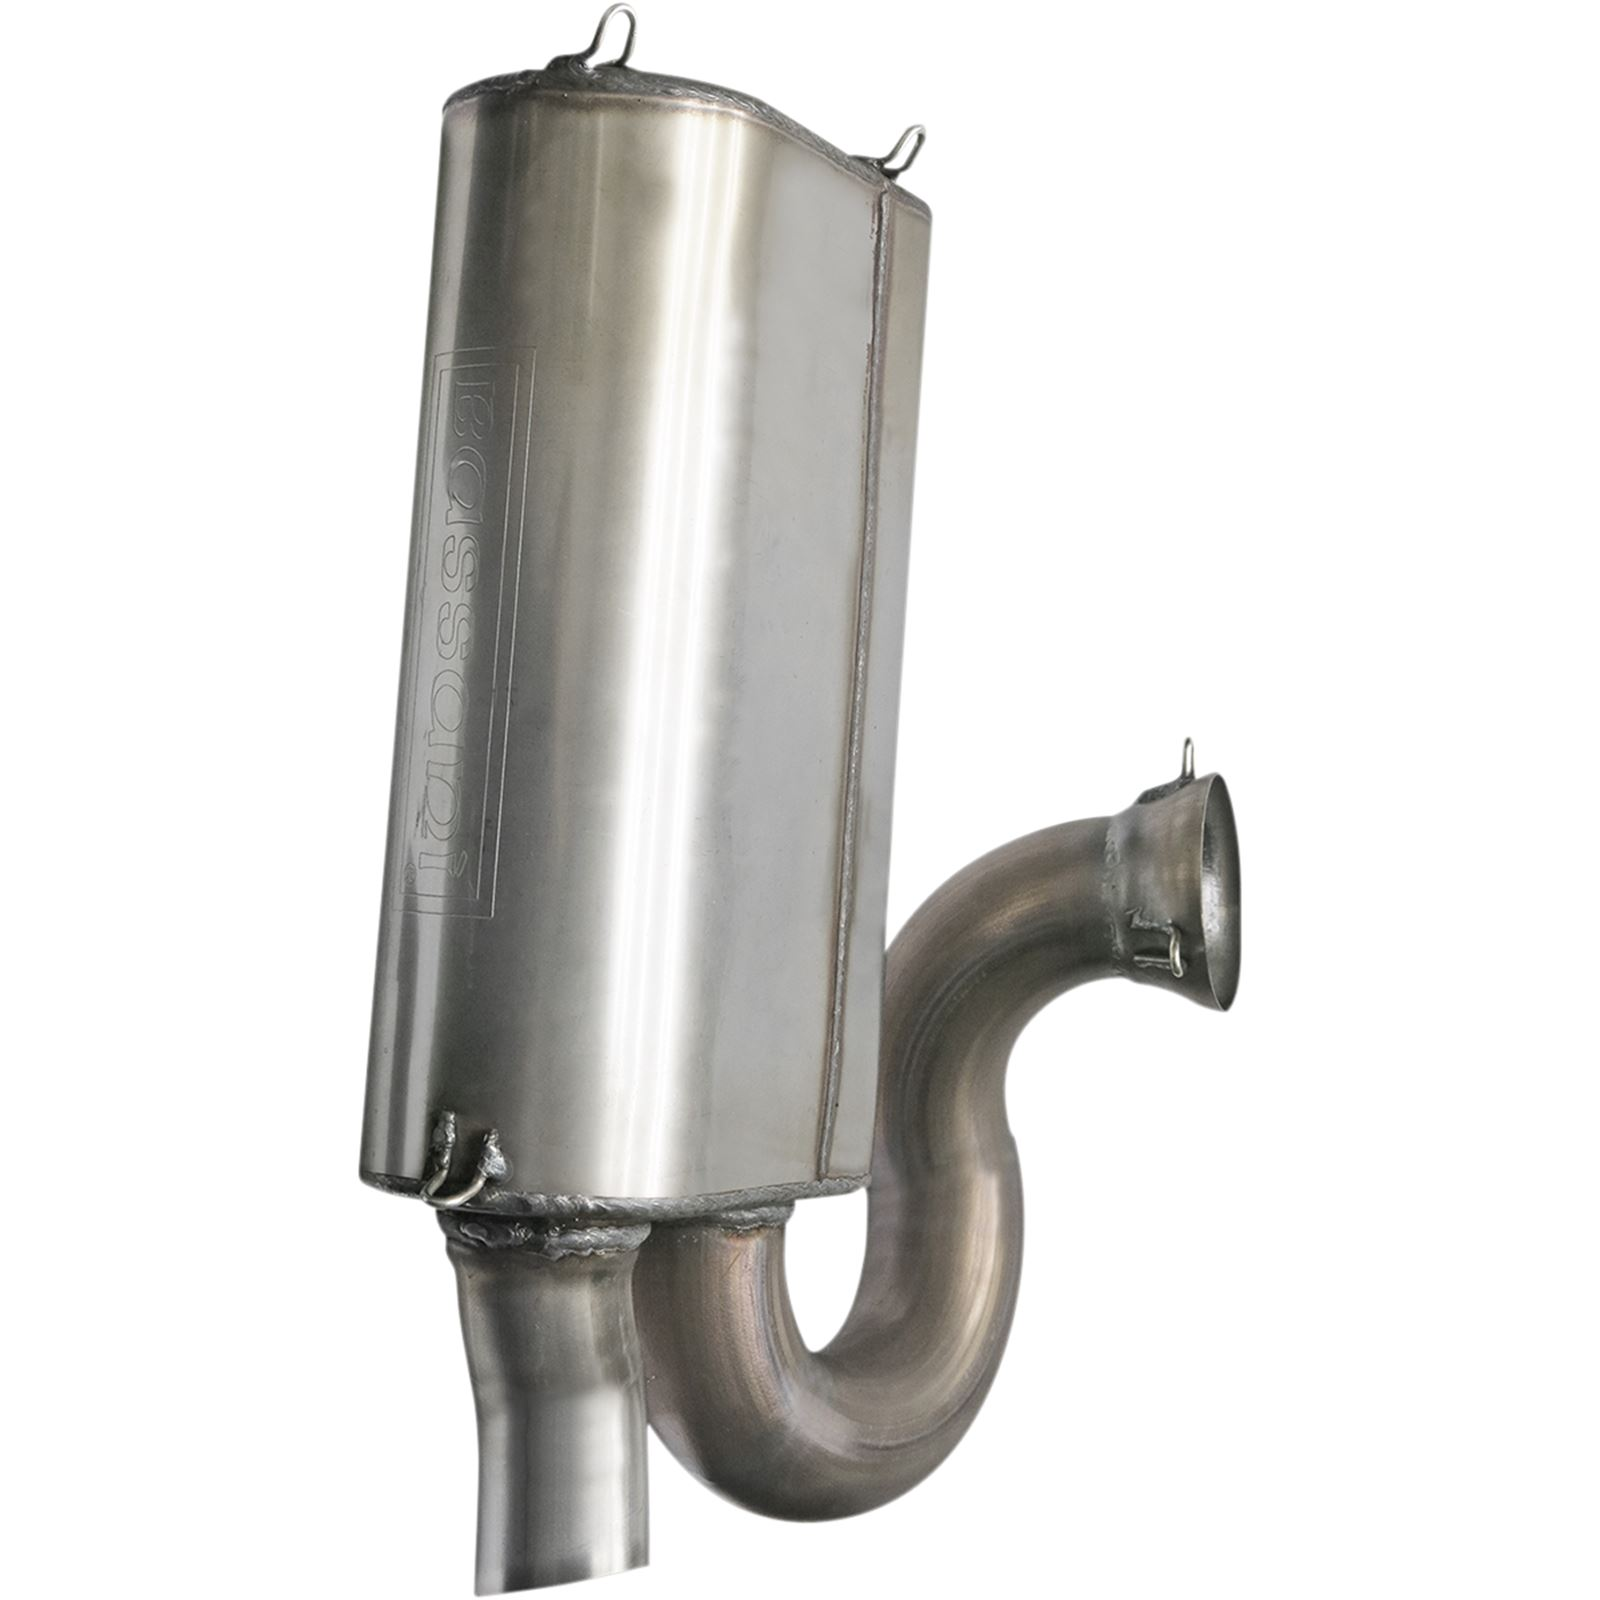 Bassani Manufacturing Muffler - Stainless Steel - Slingshot